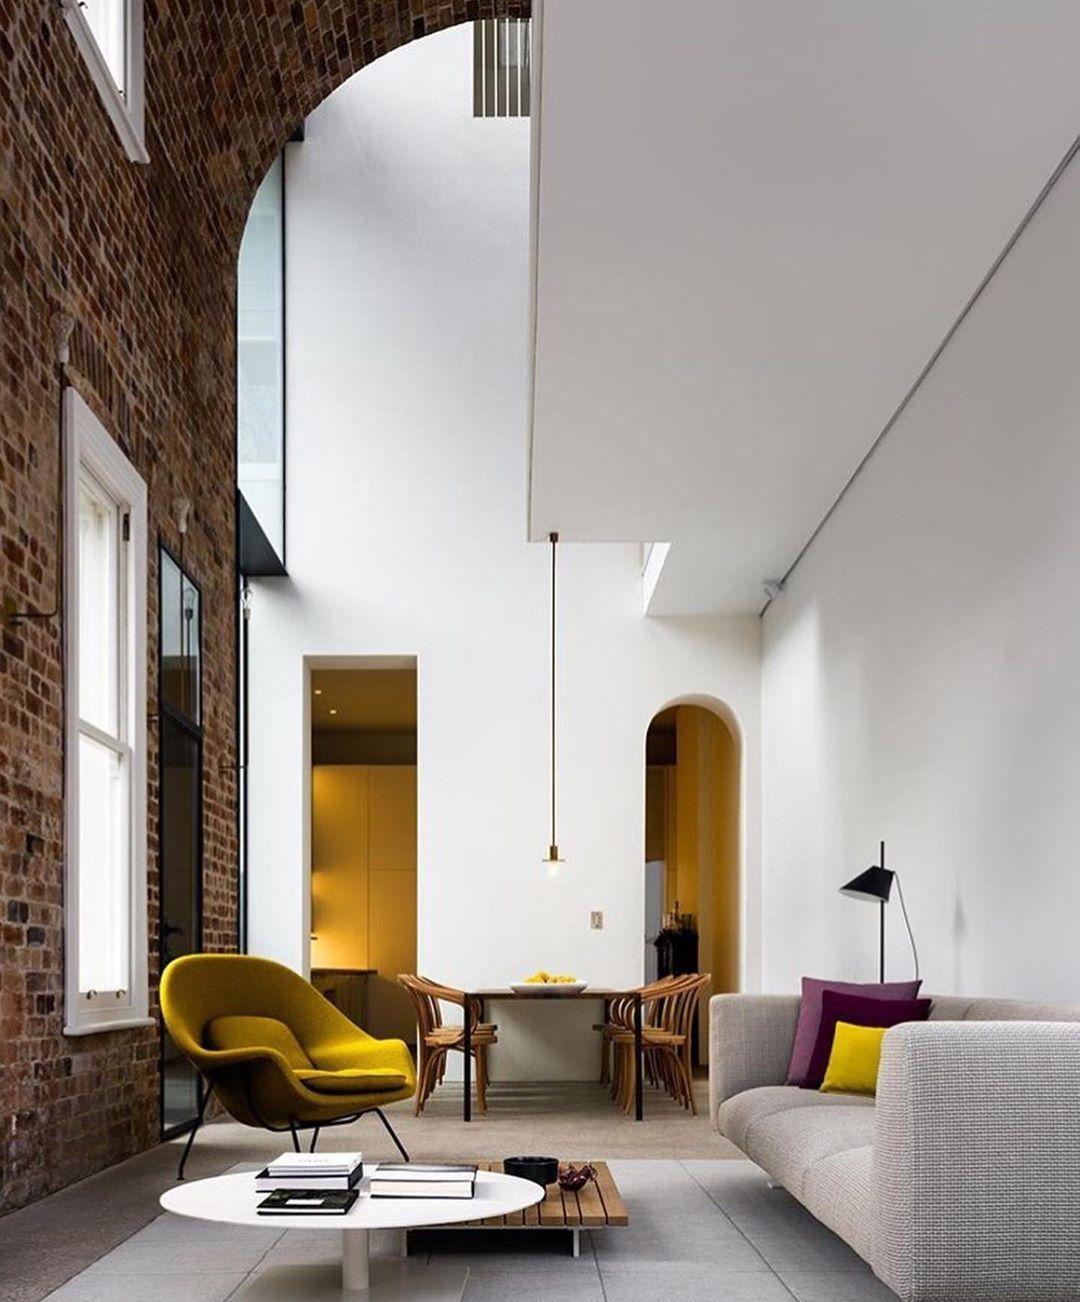 Home Design Ideas Australia: @artemiki On Instagram: Meeting The Challenge @lordd